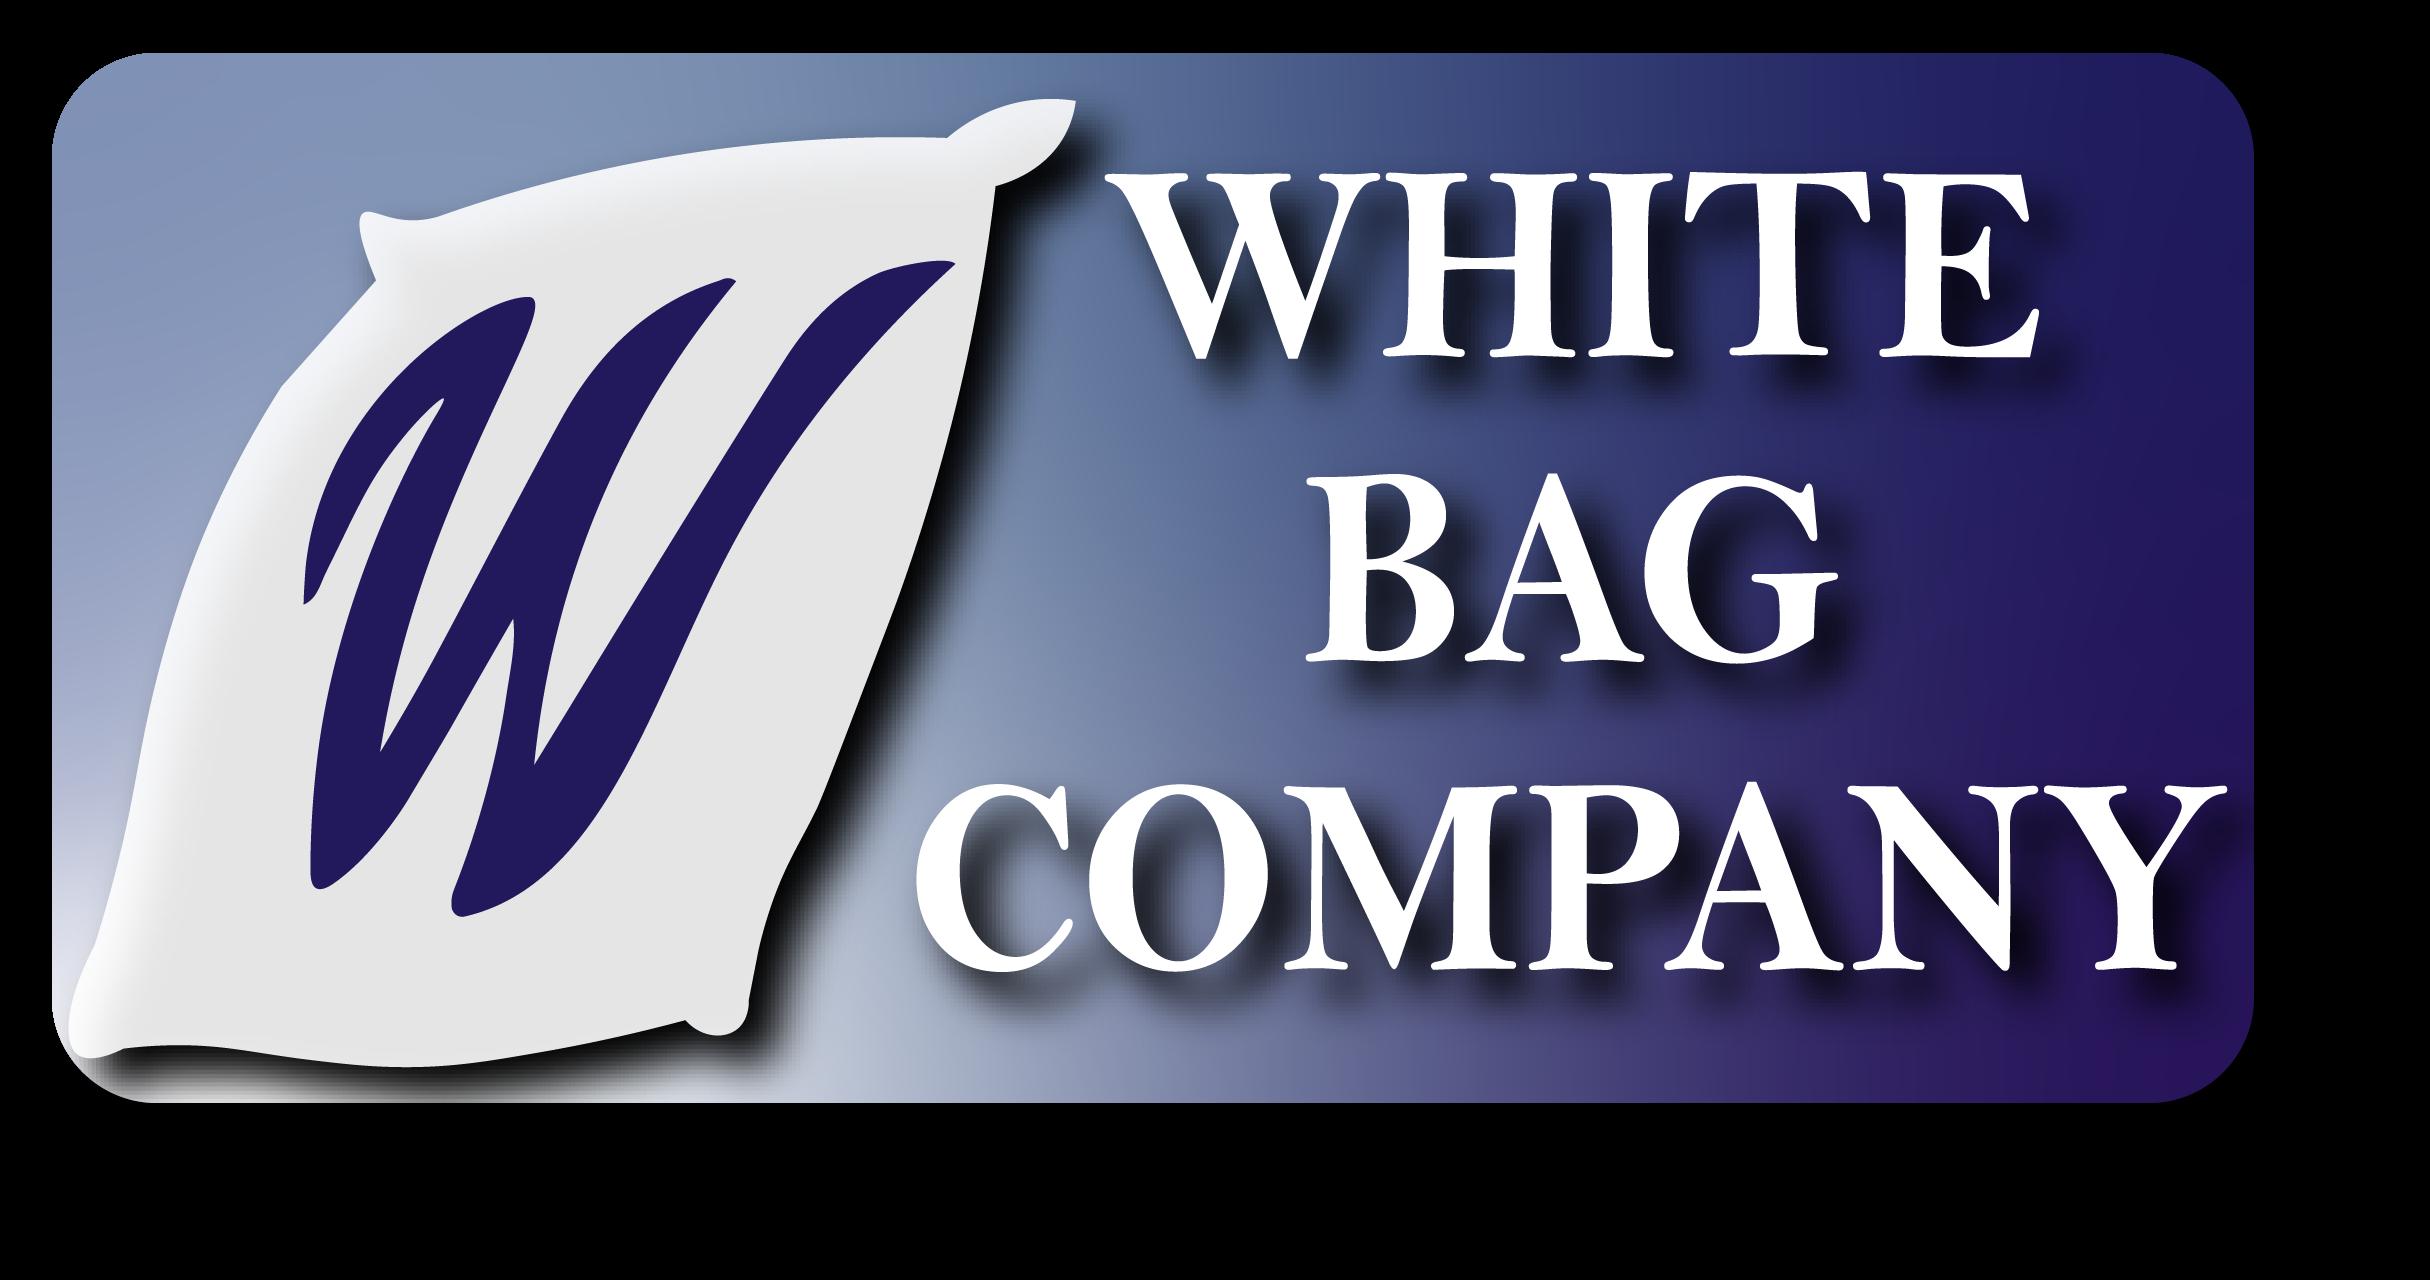 White Bag Company